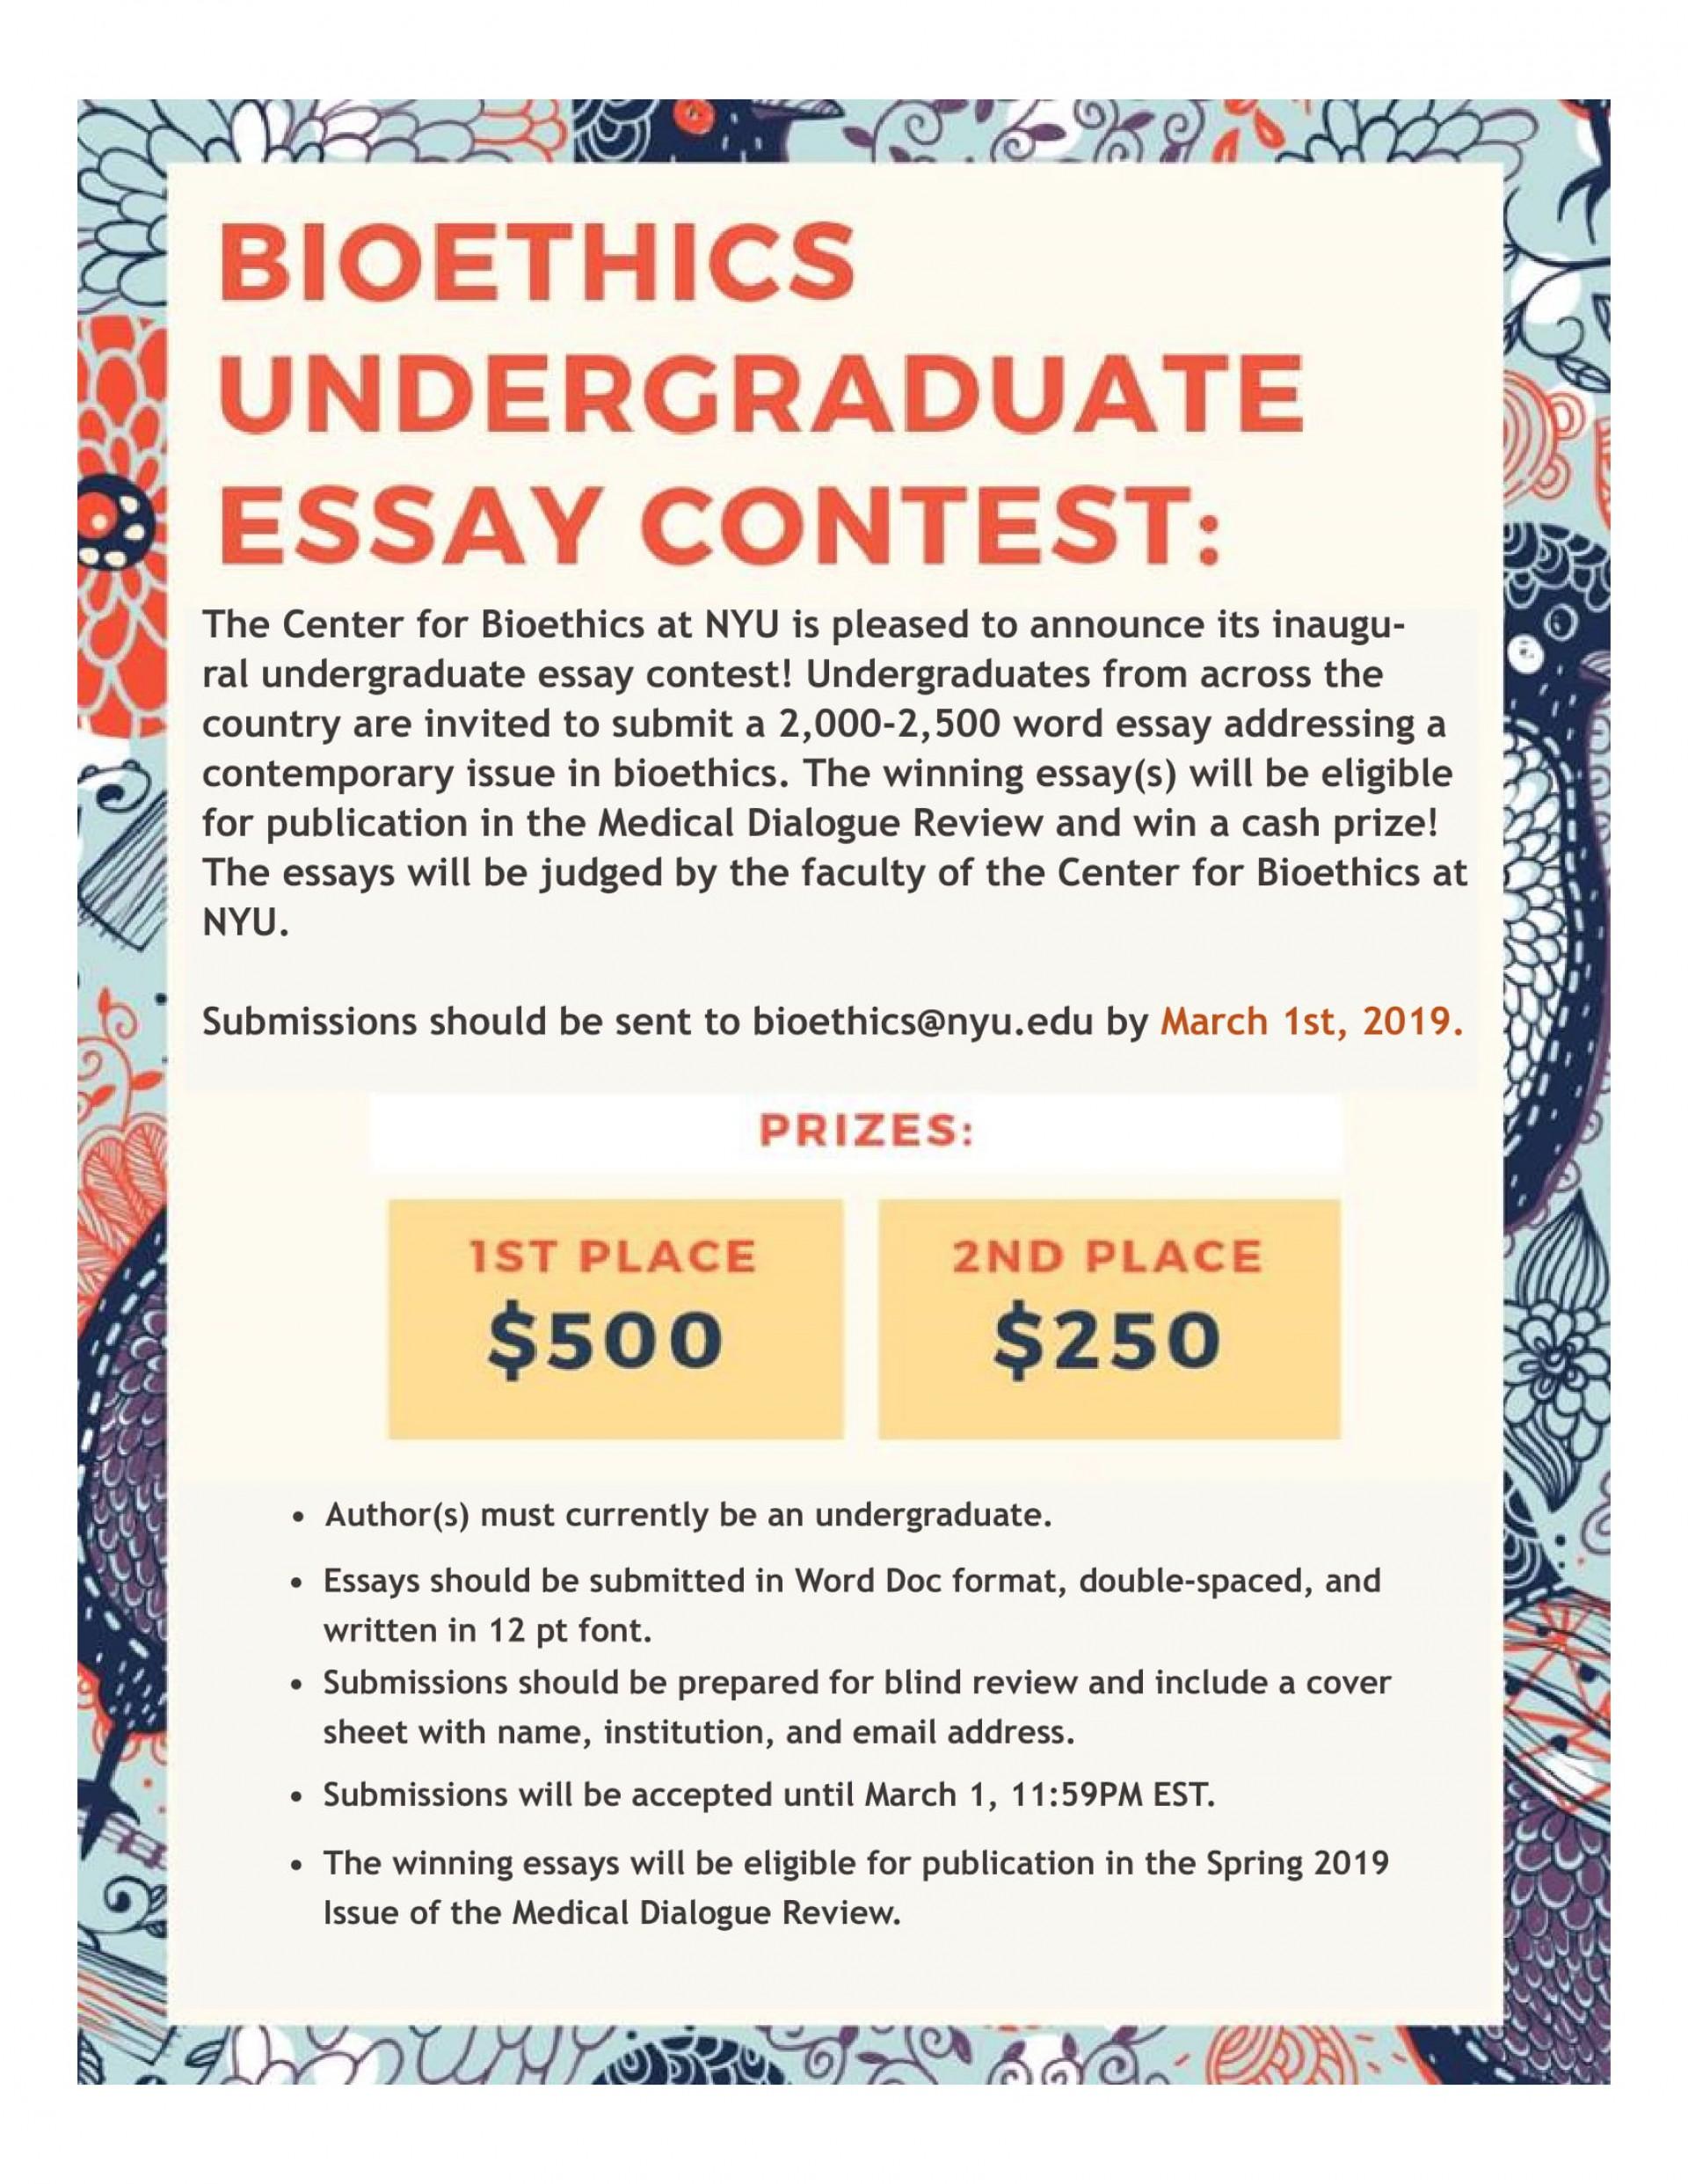 013 Essay Example Bioethics Contest Flier Why Unforgettable Nyu 2018 Stern Reddit 1920